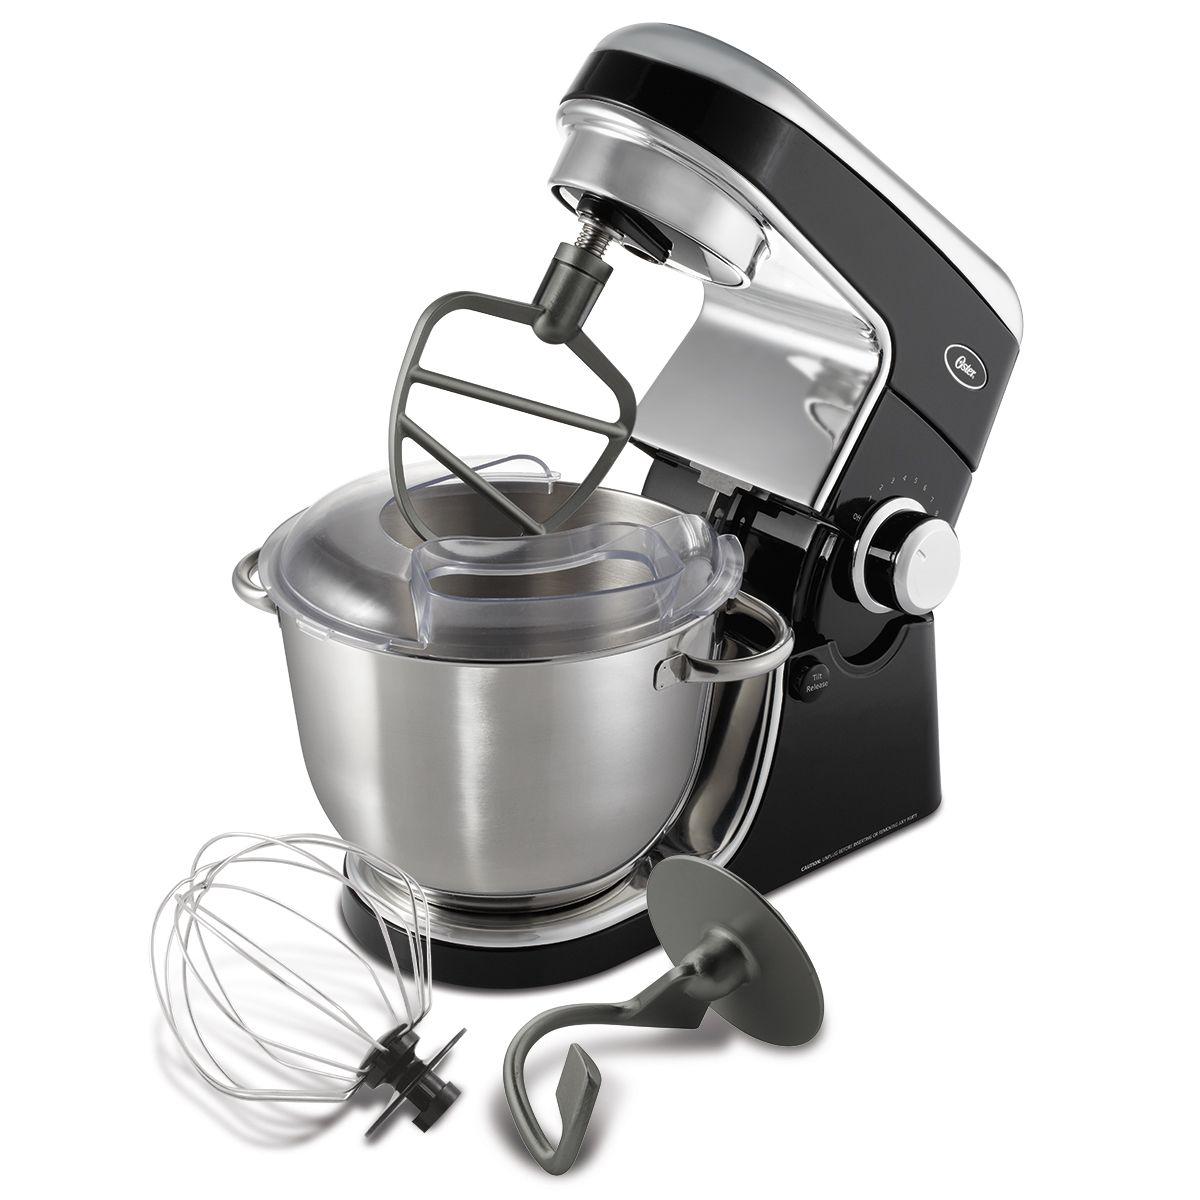 Awesome kitchenaid mixer replacement parts usa and pics di